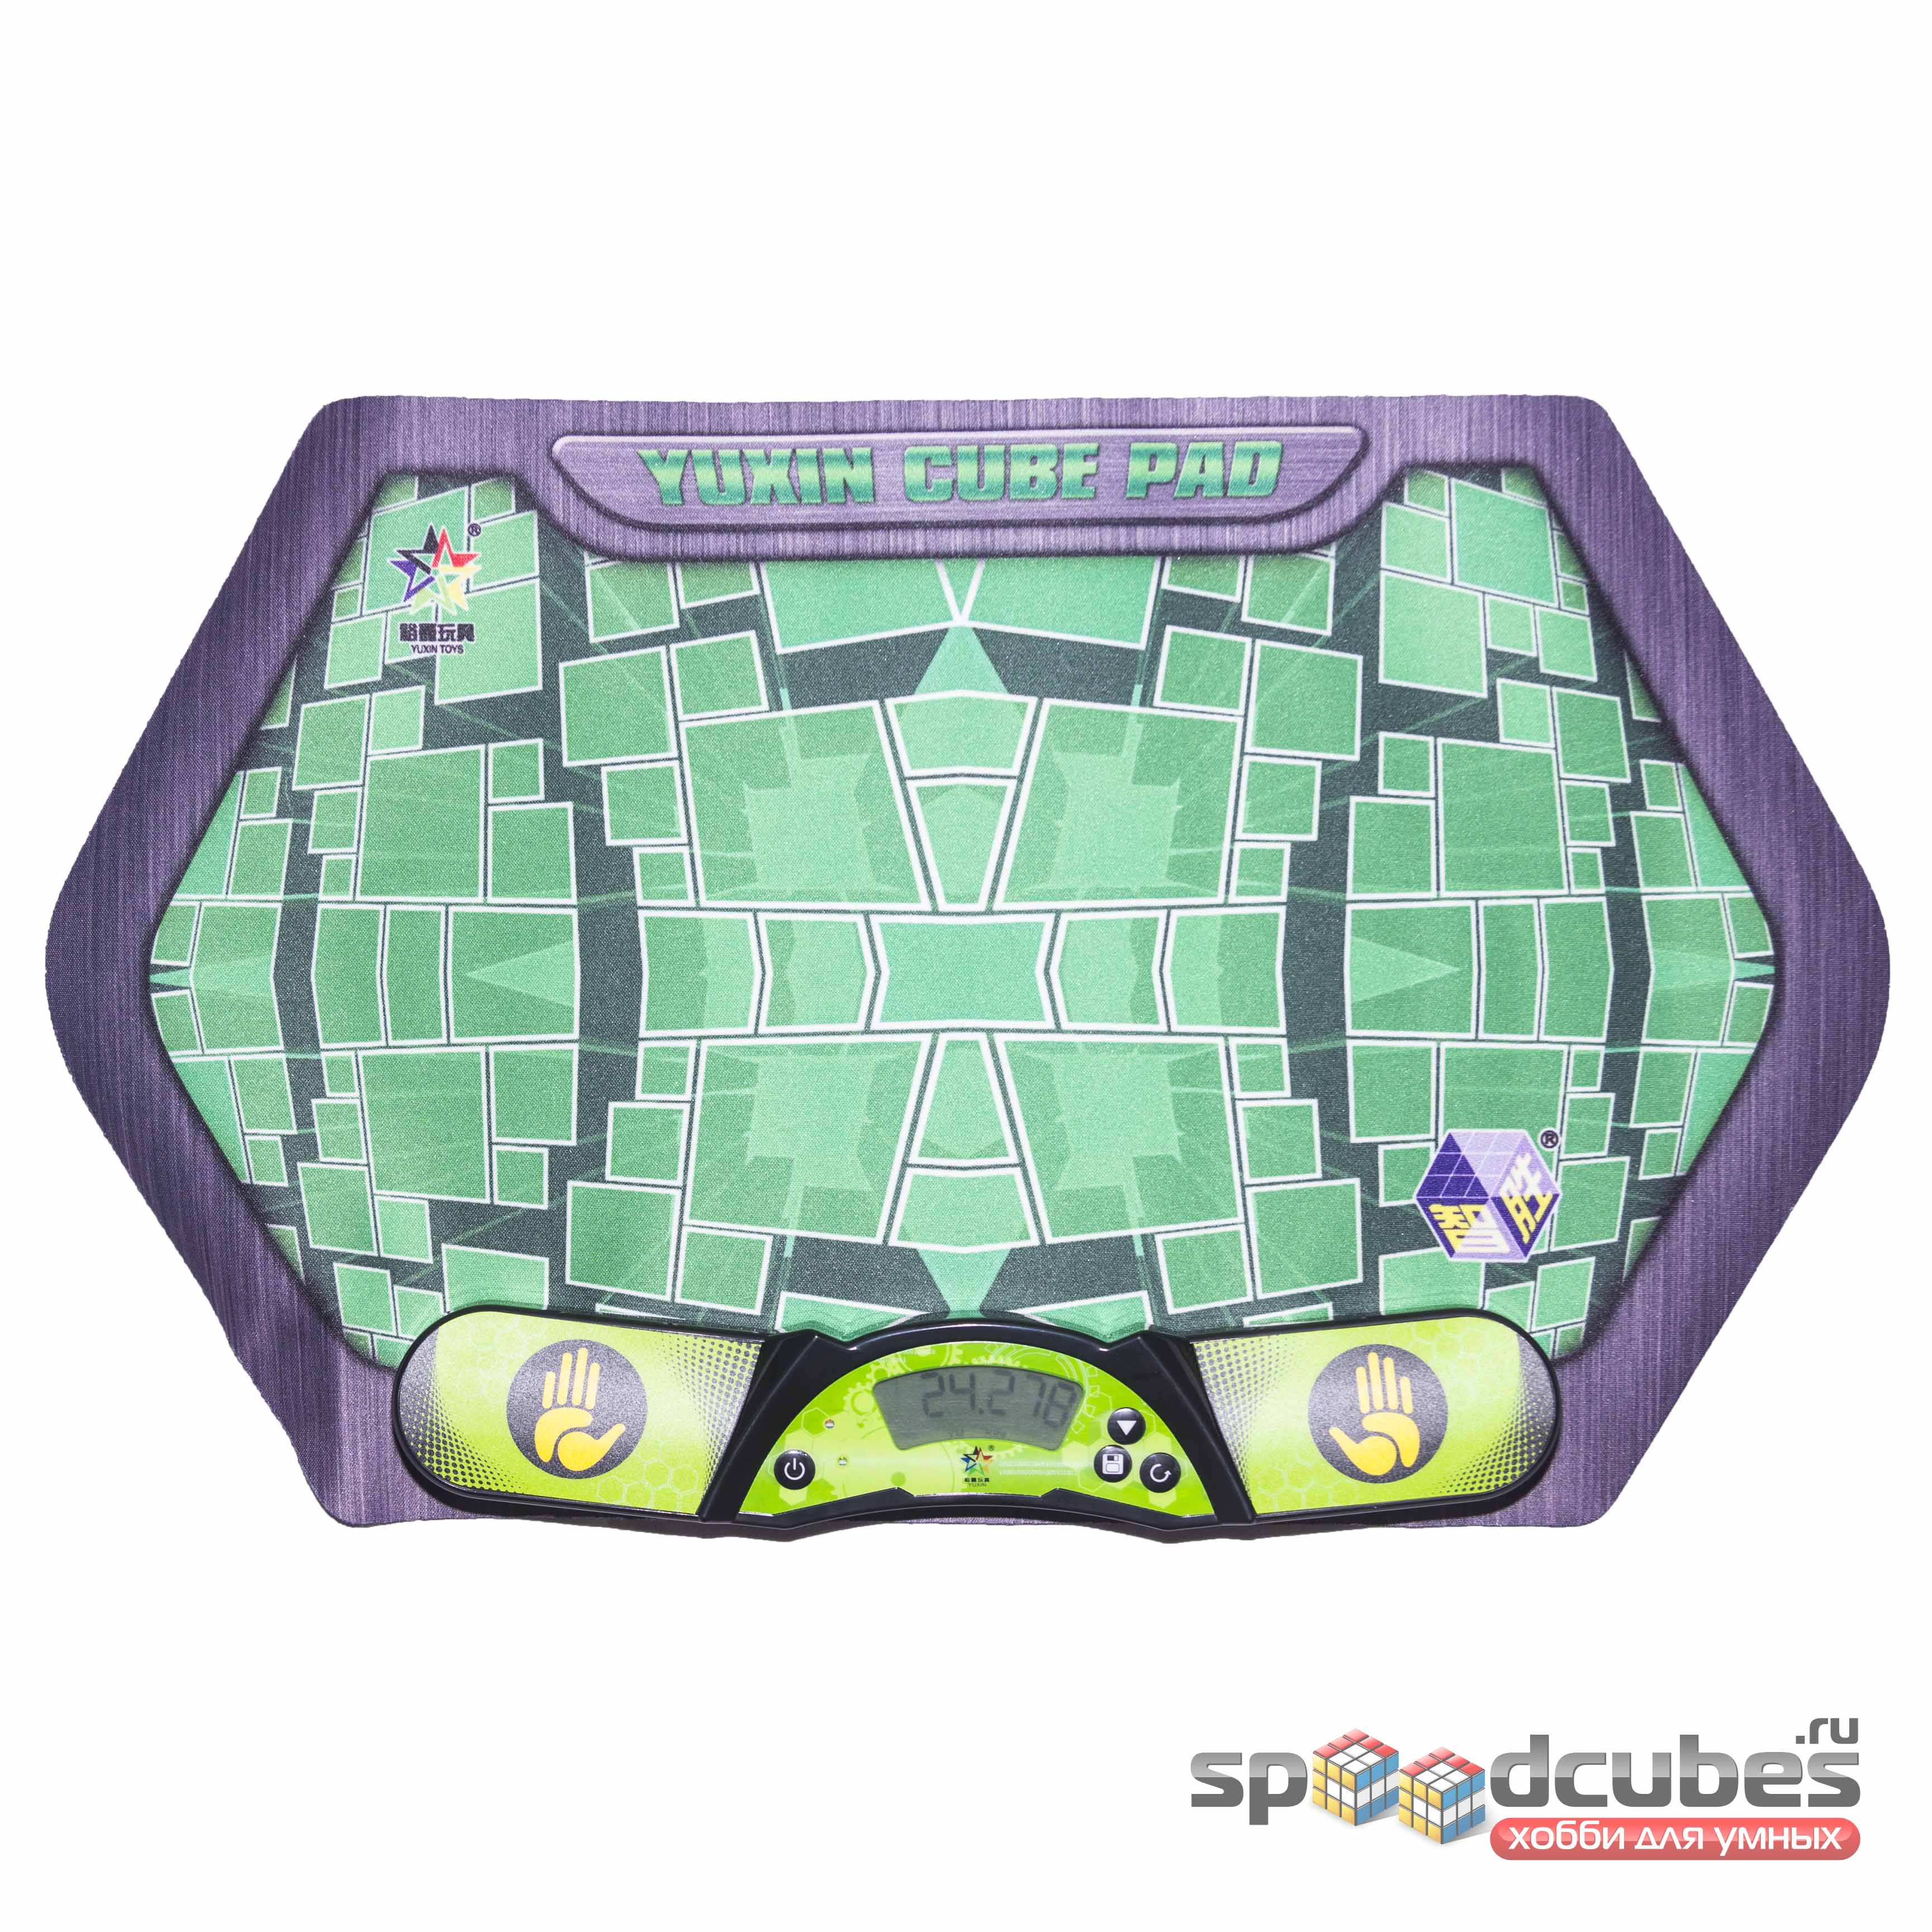 Комплект таймер YuXin V2  и мат Yuxin Cube Pad для спидкубинга